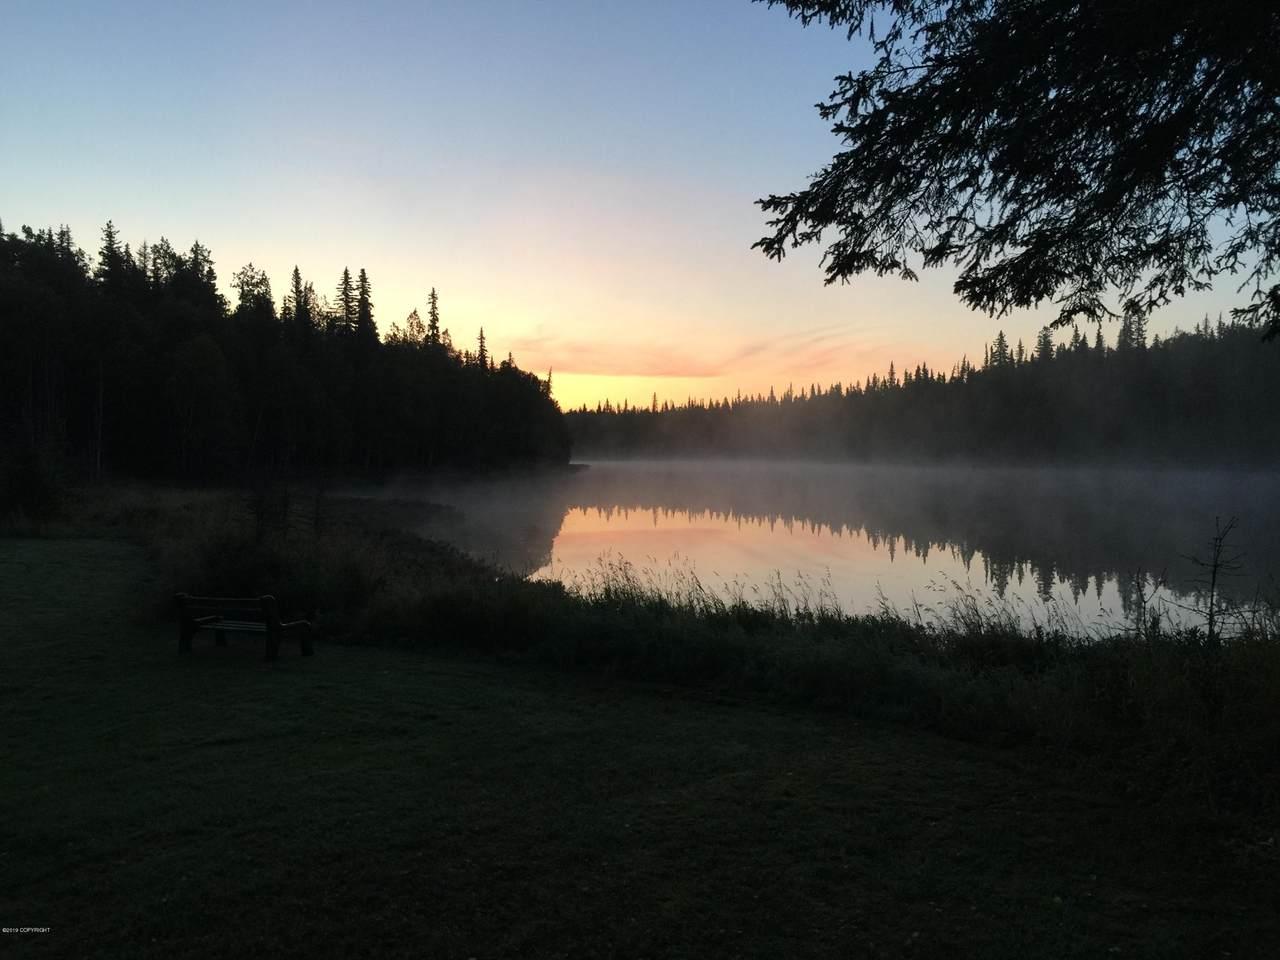 https://bt-photos.global.ssl.fastly.net/alaska/1280_boomver_1_19-15468-2.jpg